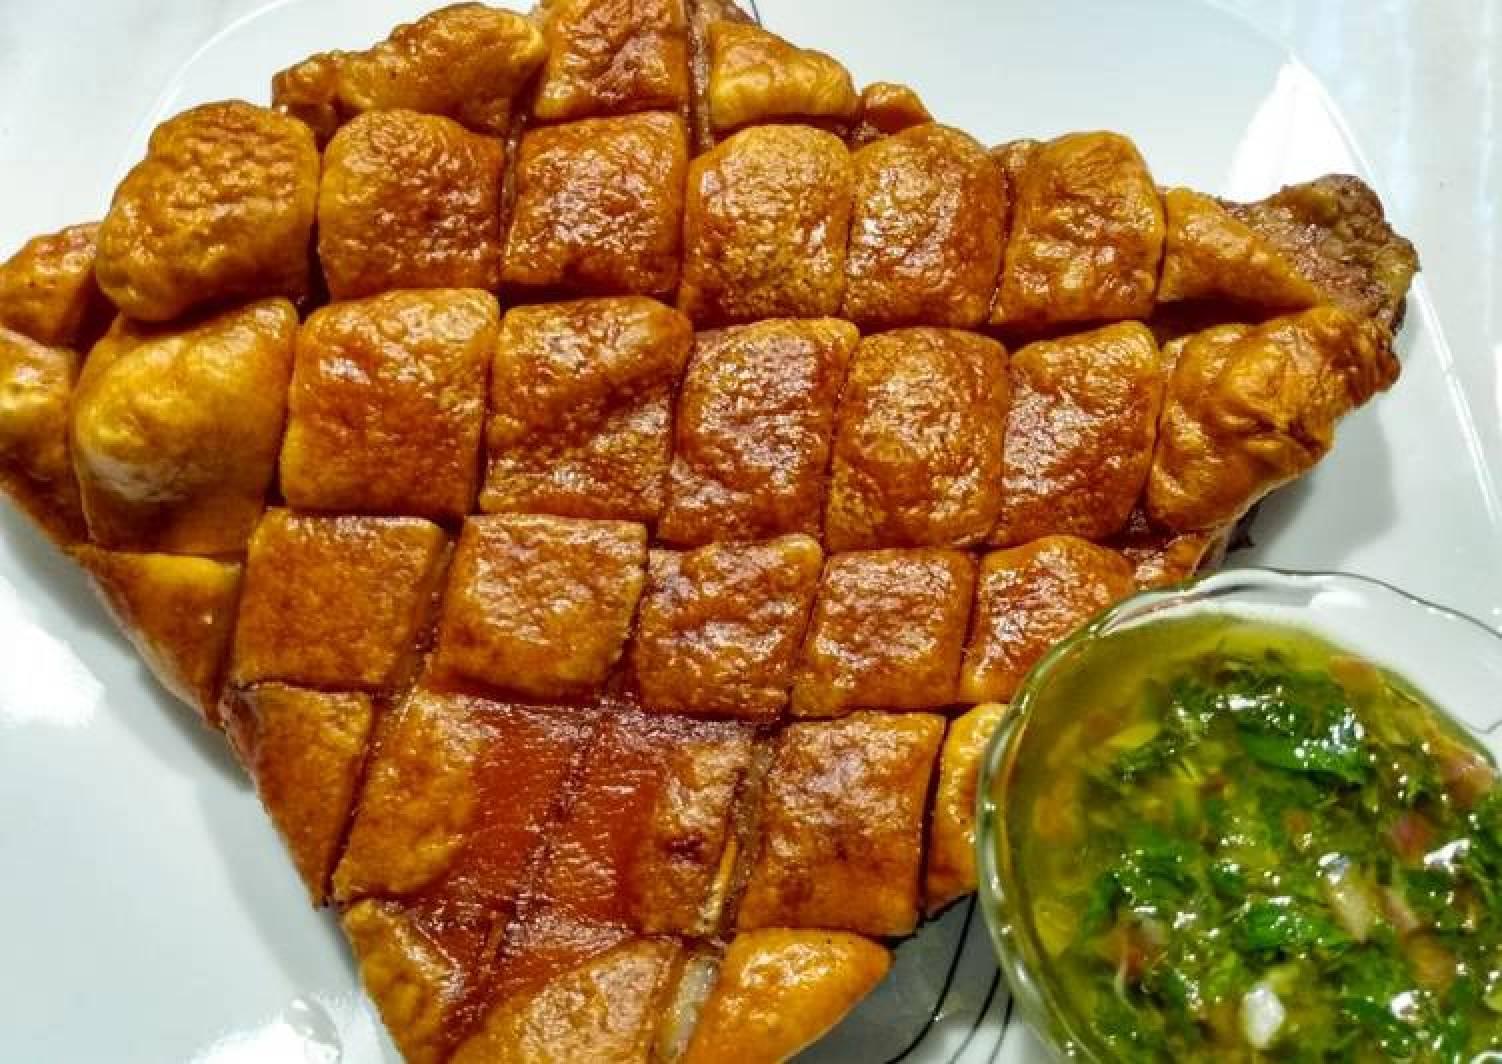 Crispy pork belly with chimichurri